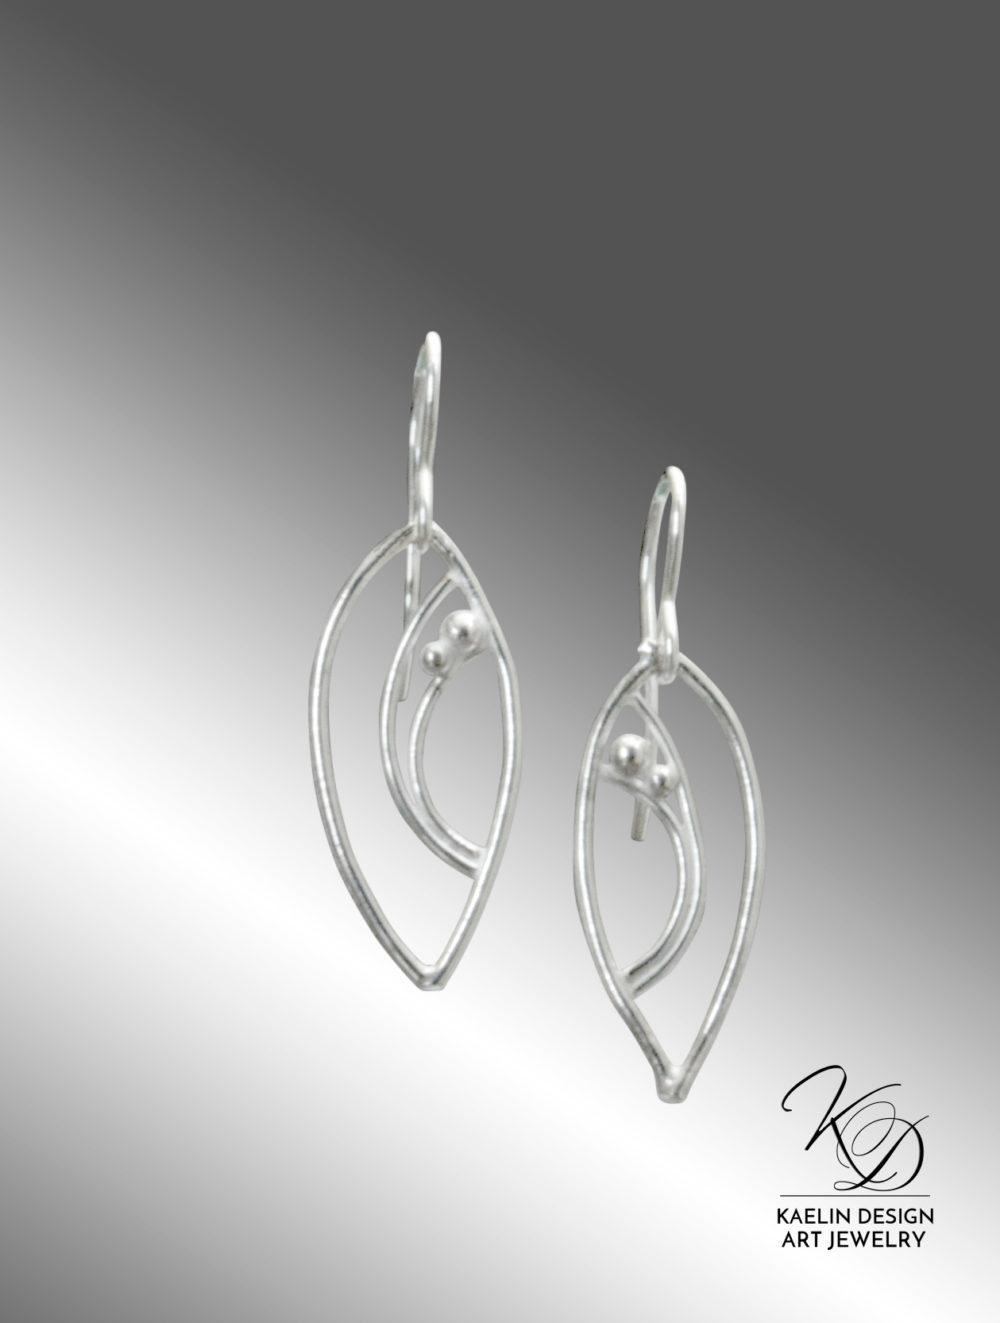 Gentle Tides Hand Forged Silver Art Earrings